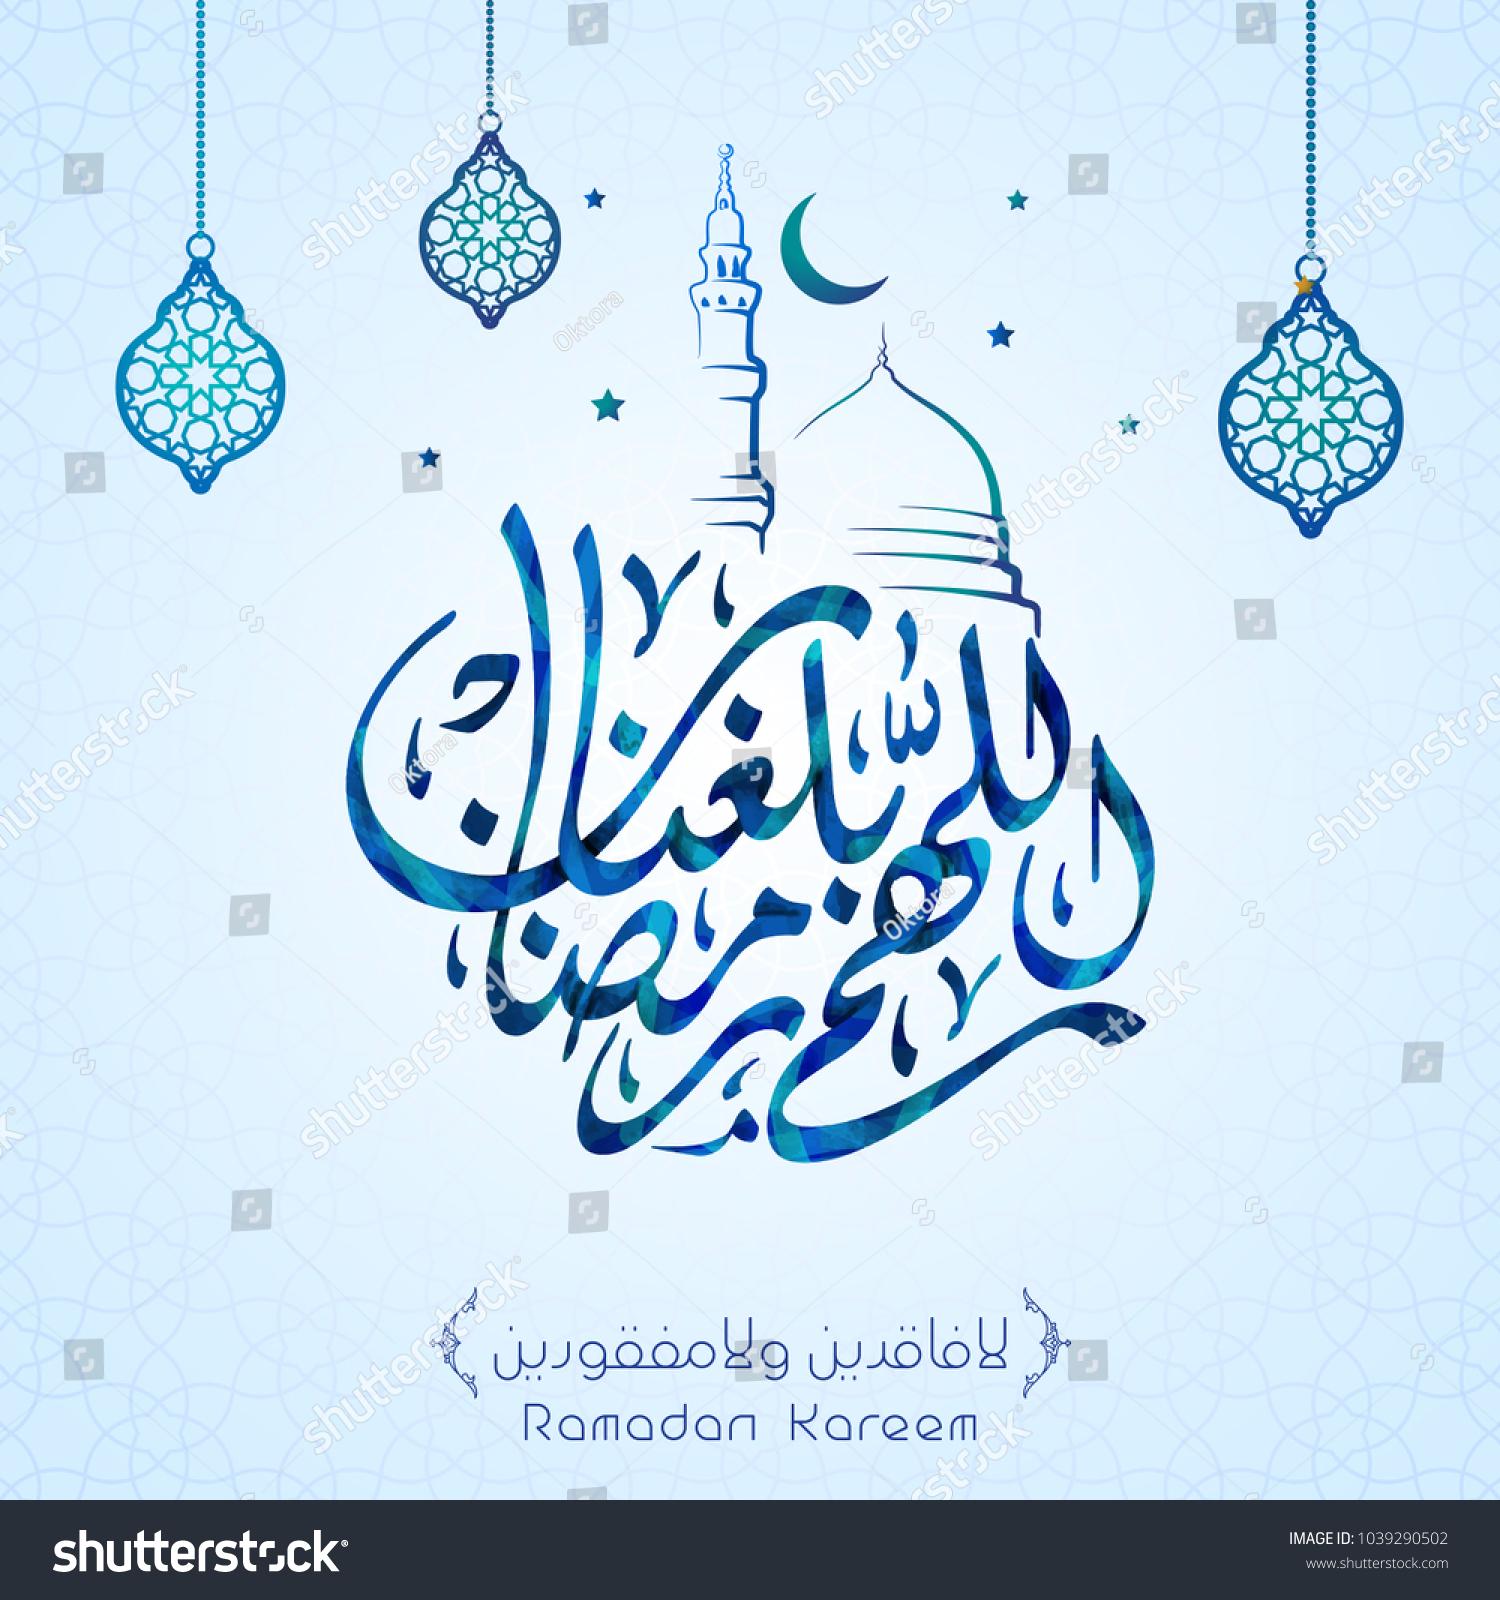 Ramadan kareem welcome greeting arabic calligraphy stock vector ramadan kareem welcome greeting with arabic calligraphy kristyandbryce Gallery